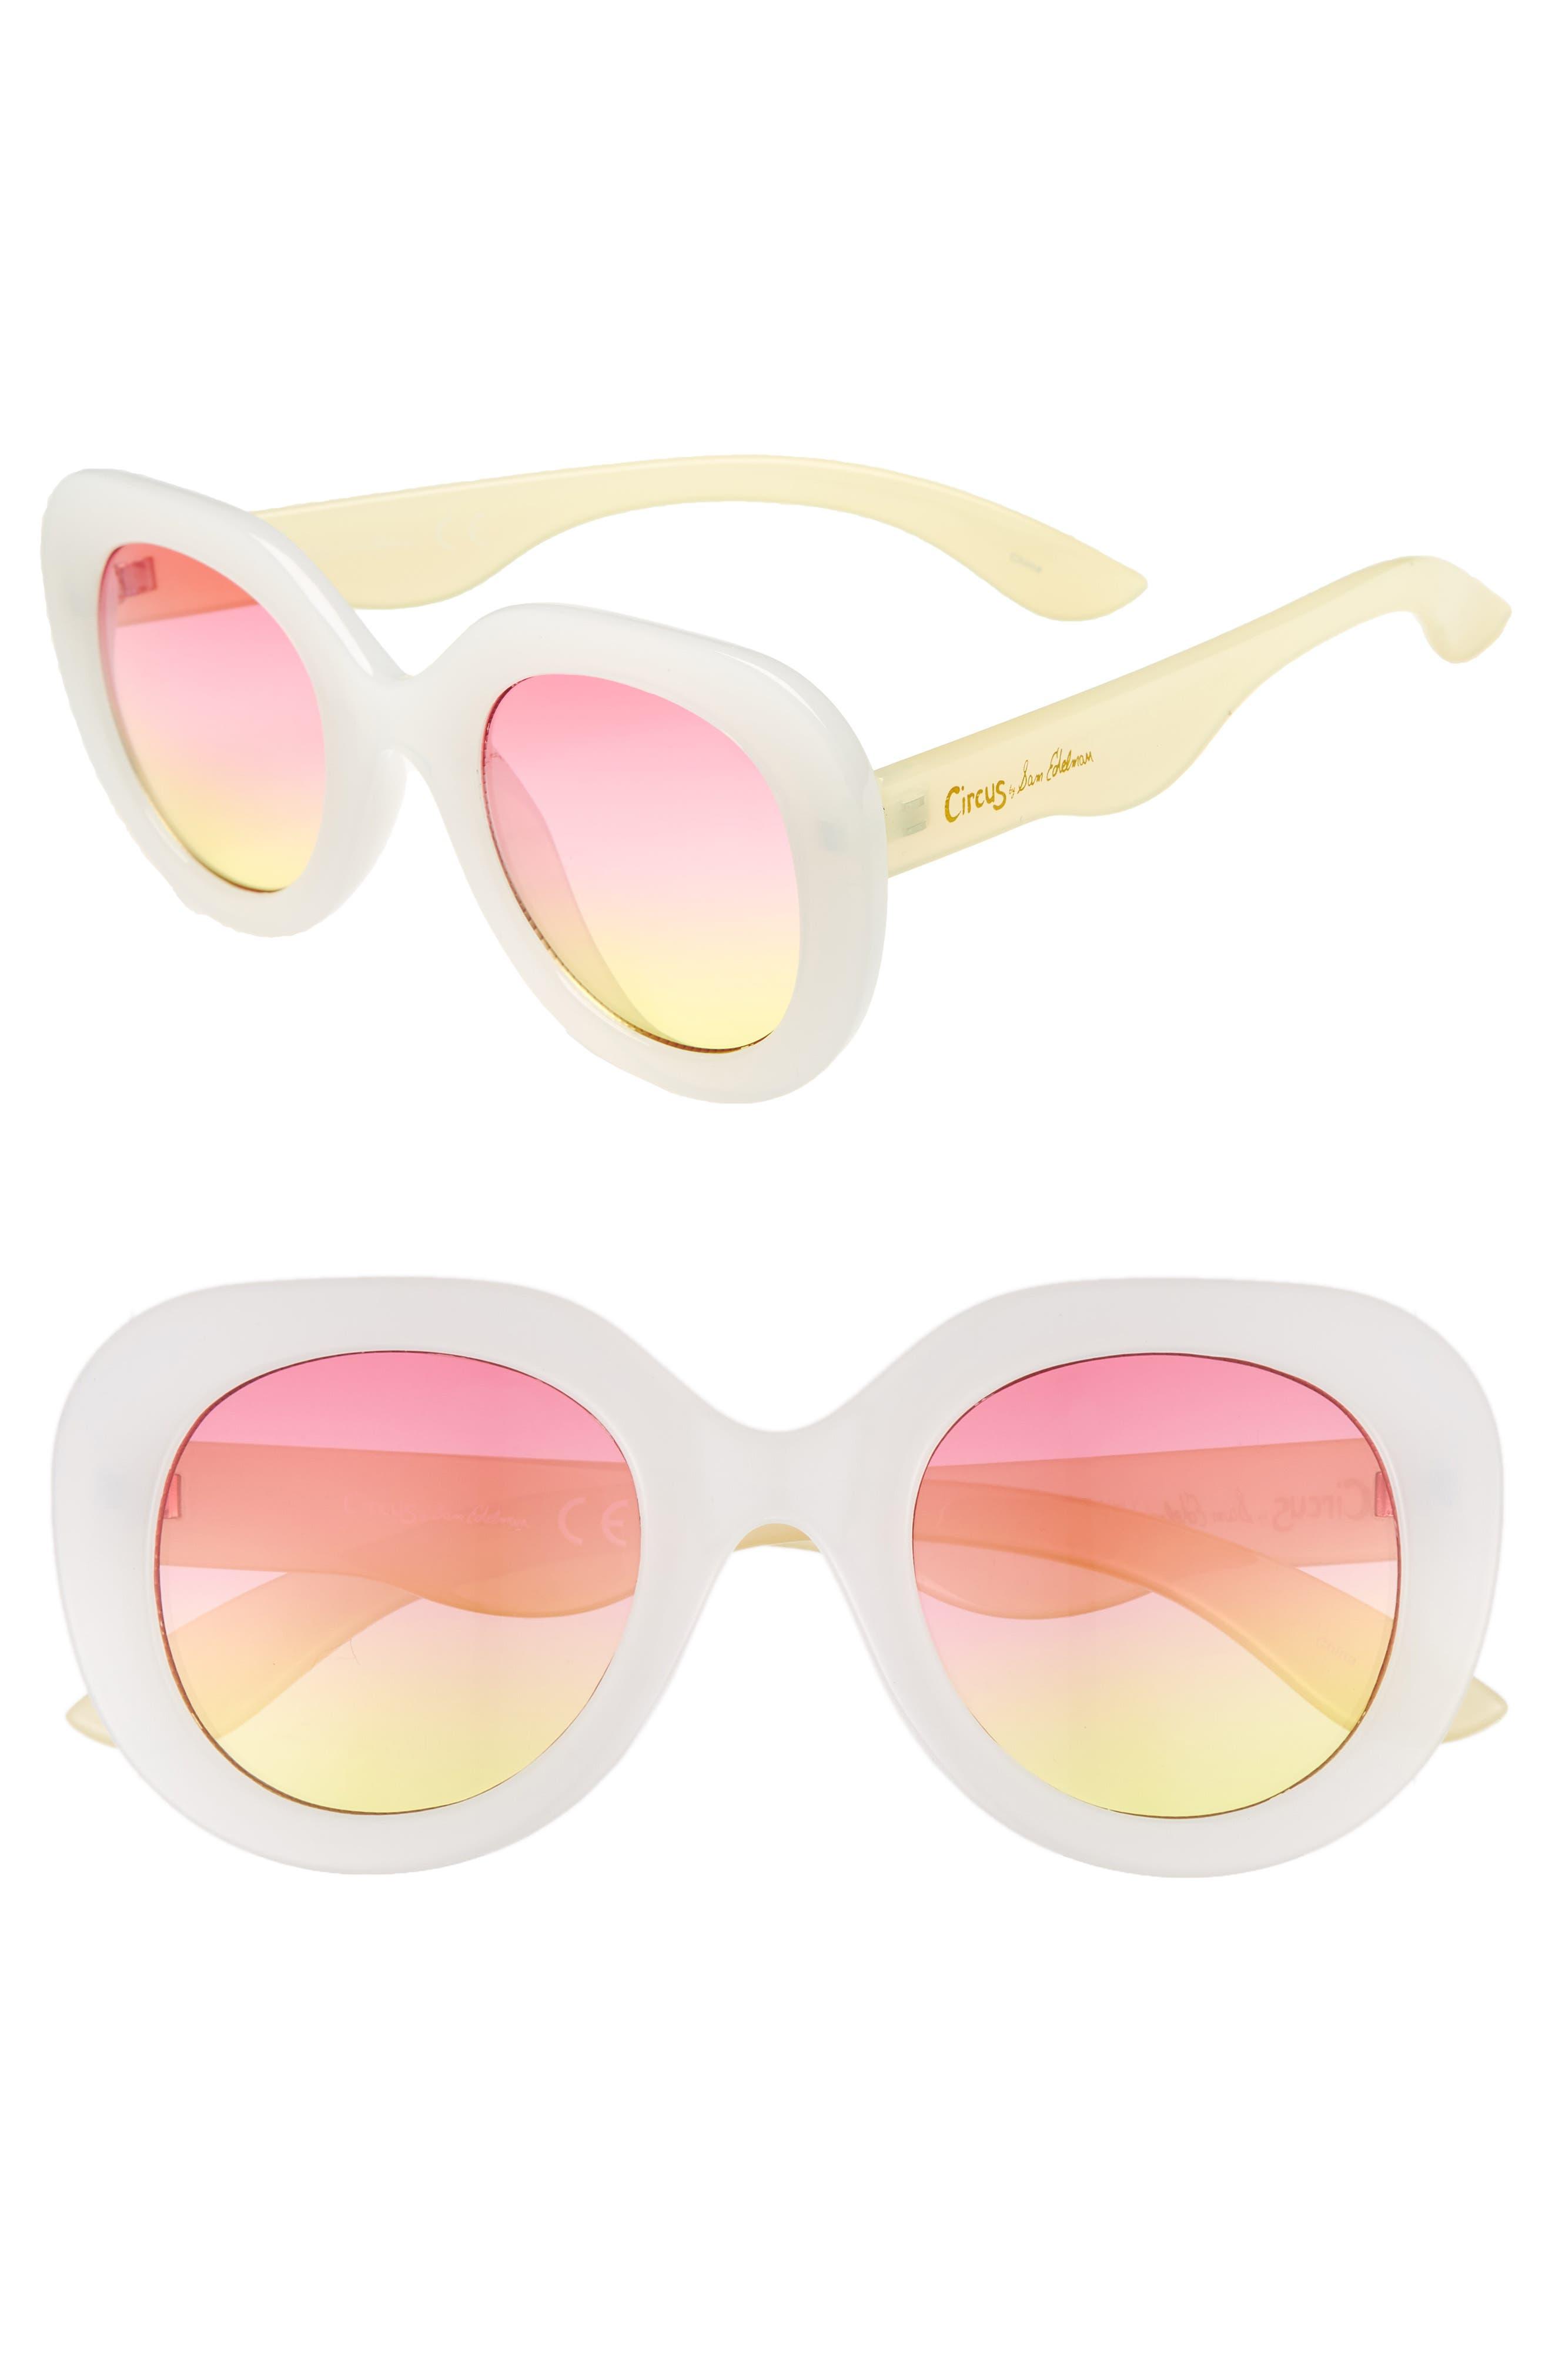 45mm Round Sunglasses,                         Main,                         color, White/ Yellow